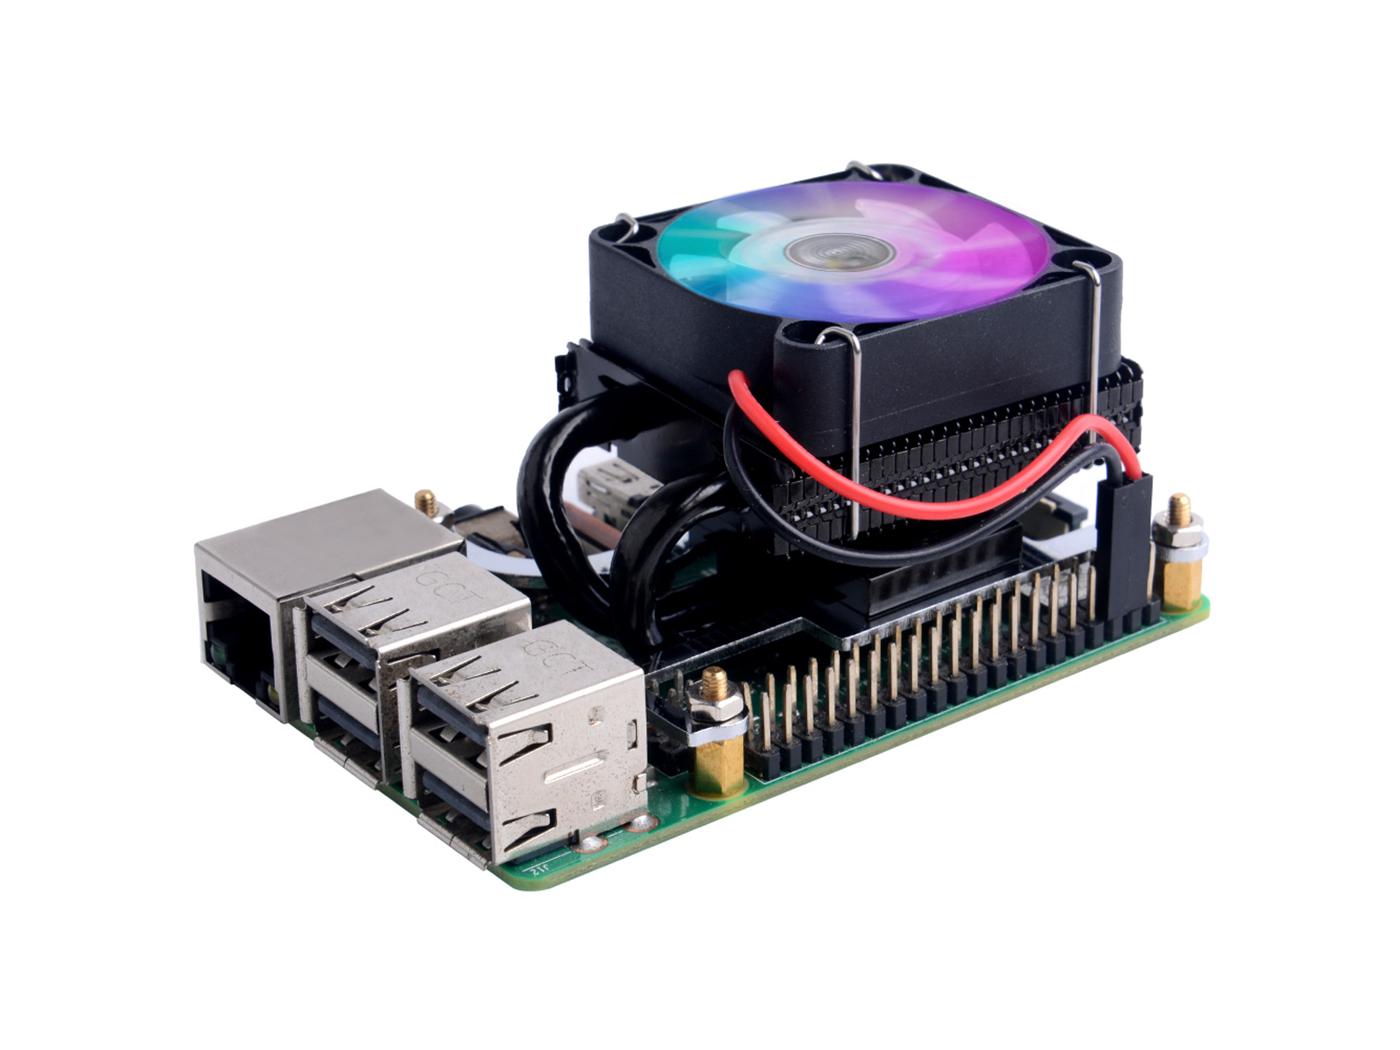 Black Low-Profile ICE Cooling Fan for Raspberry Pi 3B/3B+/4B